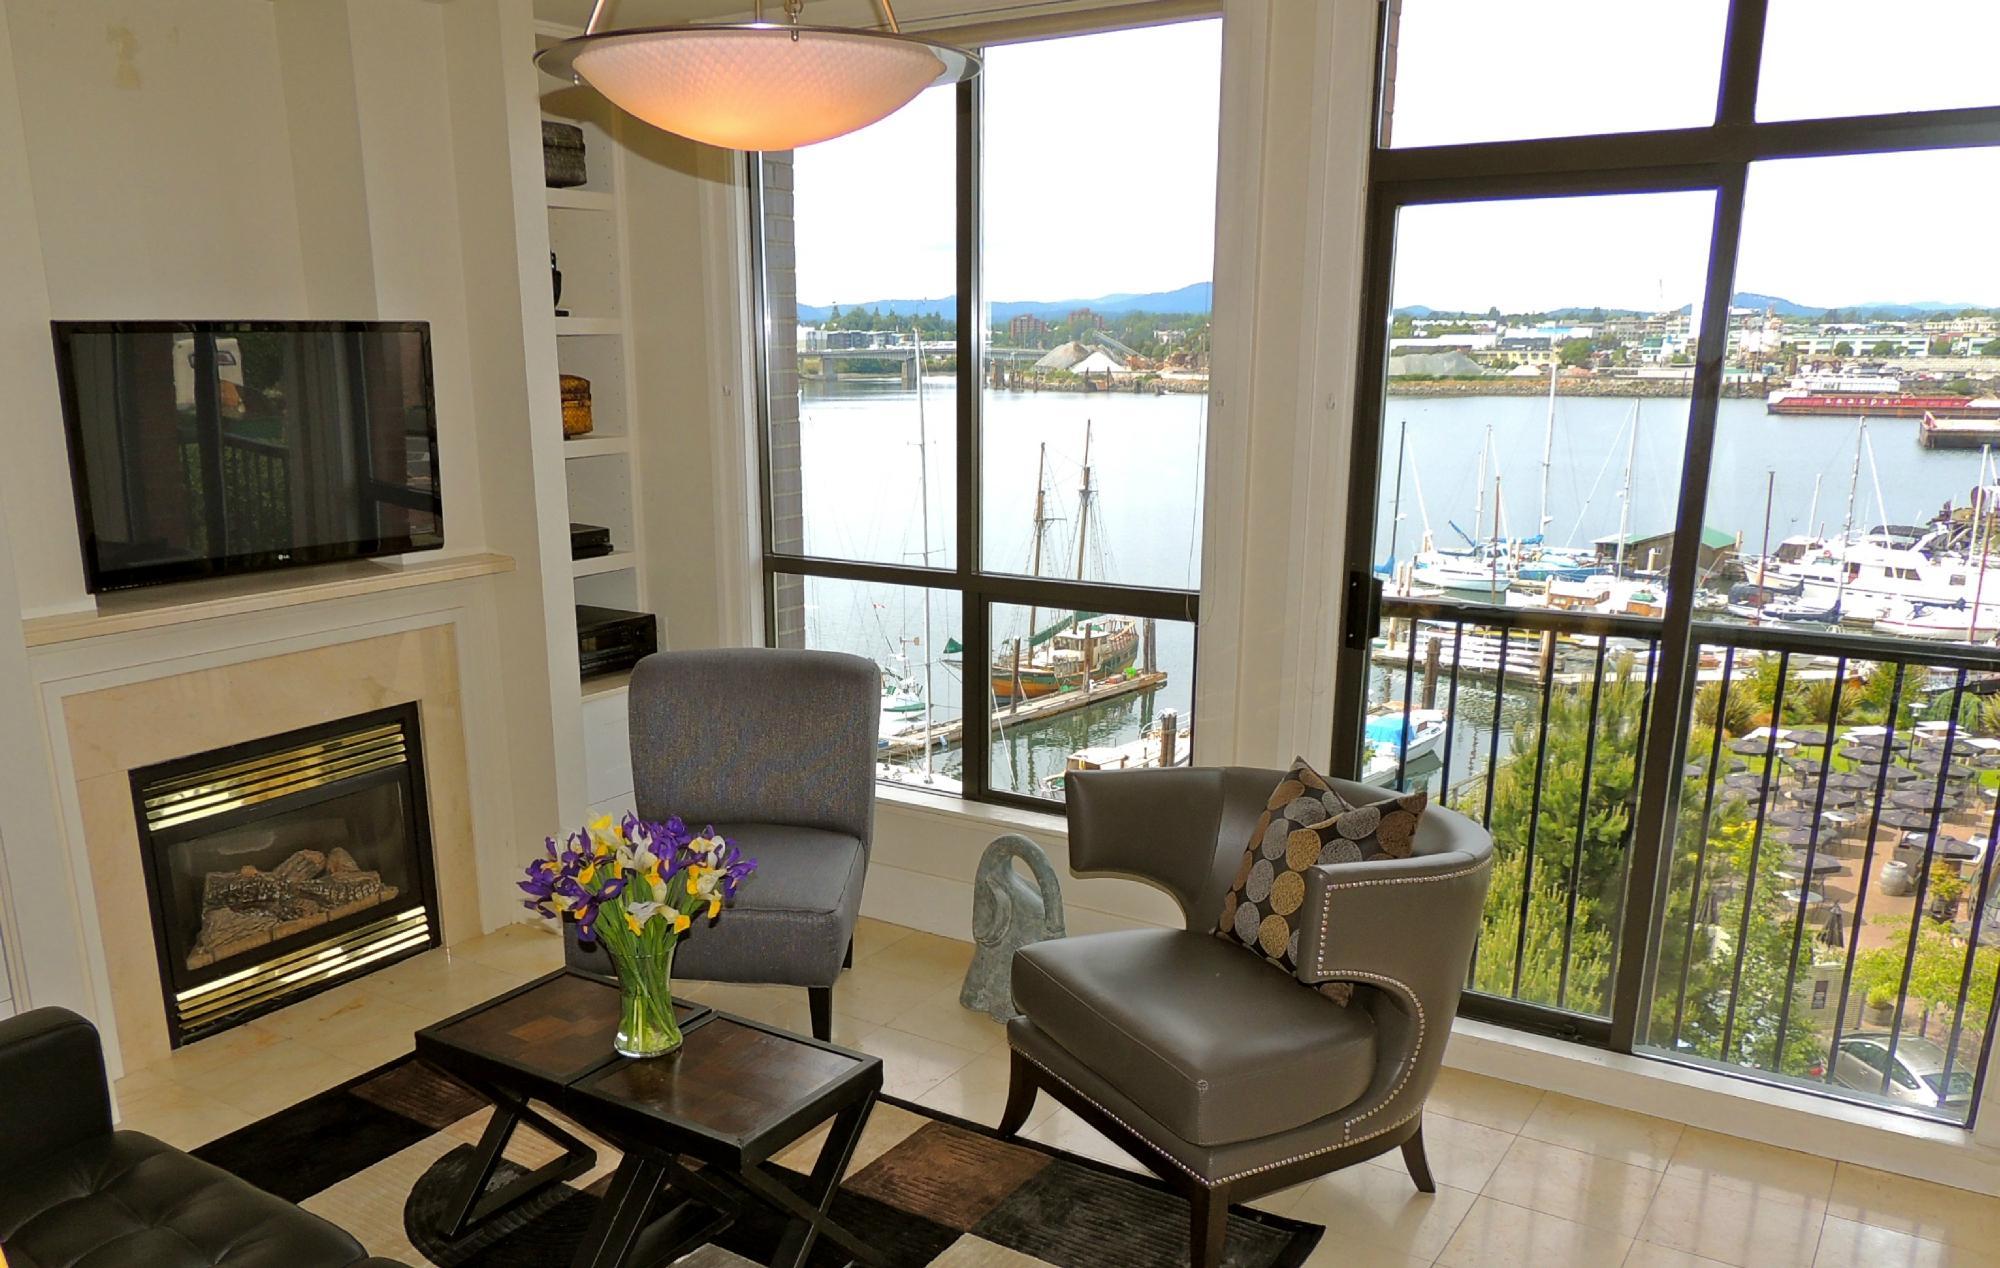 City Life Suites, Victoria